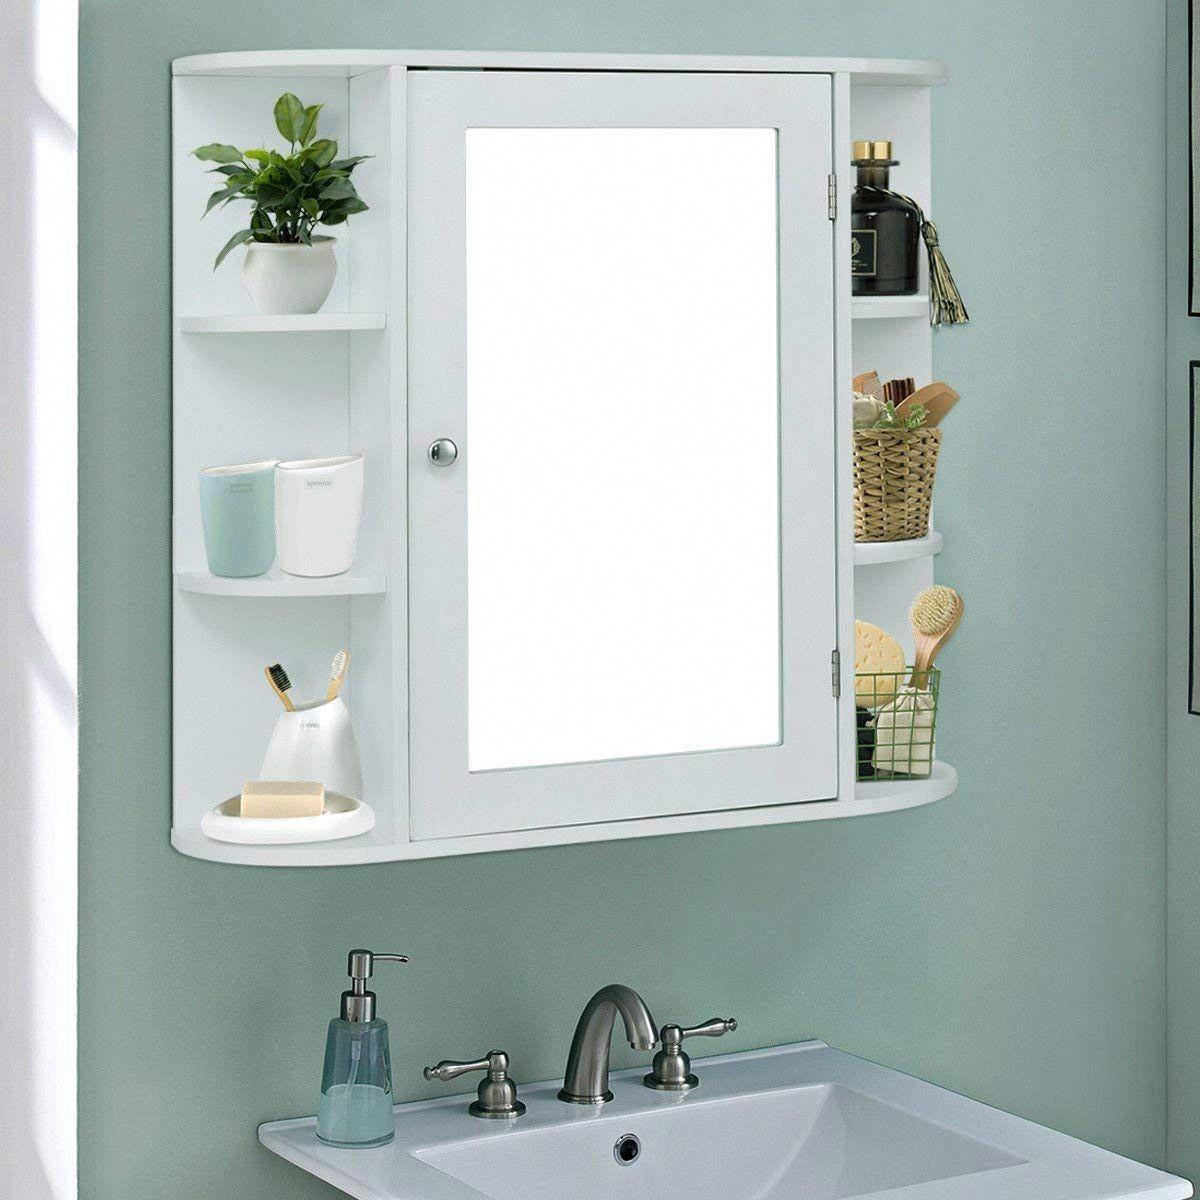 Bathroomwallfurnituremirror Wall Mounted Bathroom Cabinets Bathroom Floor Cabinets Wood Bathroom Cabinets